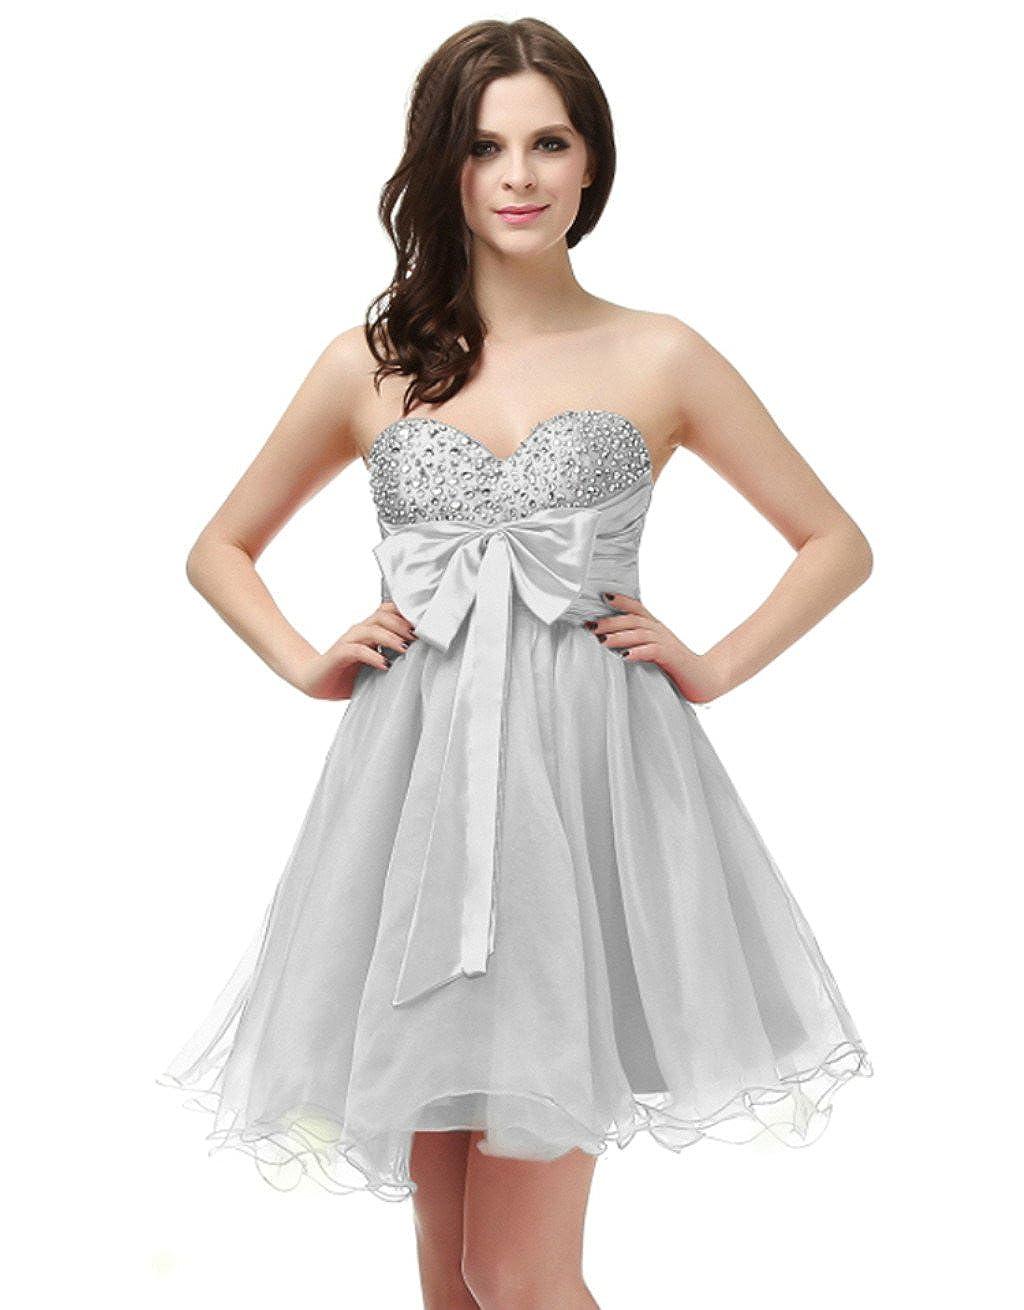 Silver Vantexi Women's Organza Short Beaded Homecoming Dress Prom Gown